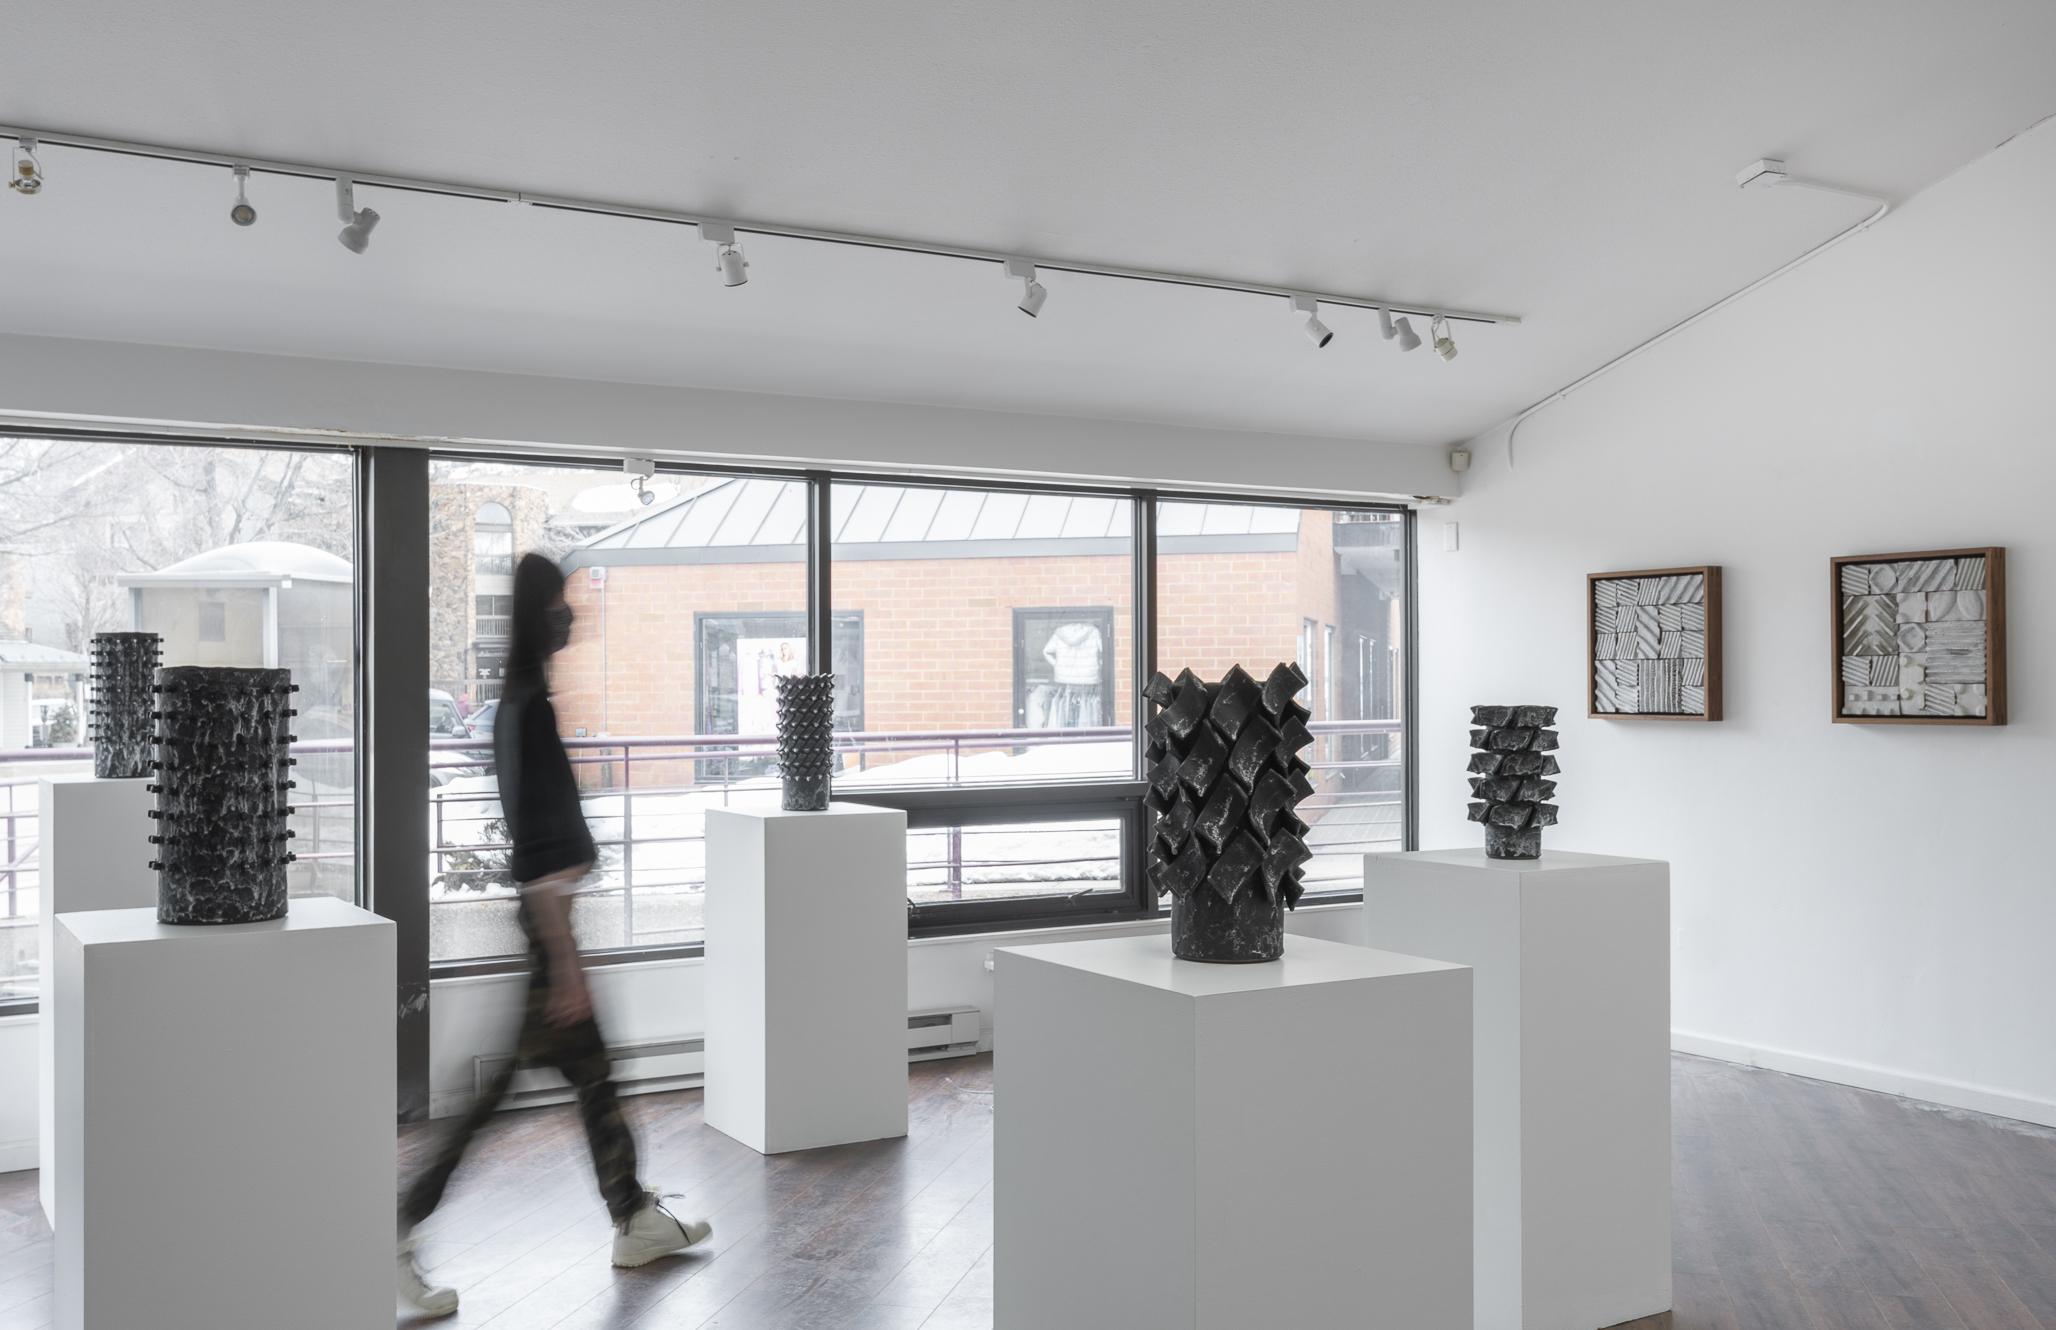 Installation view (Ben Medansky)